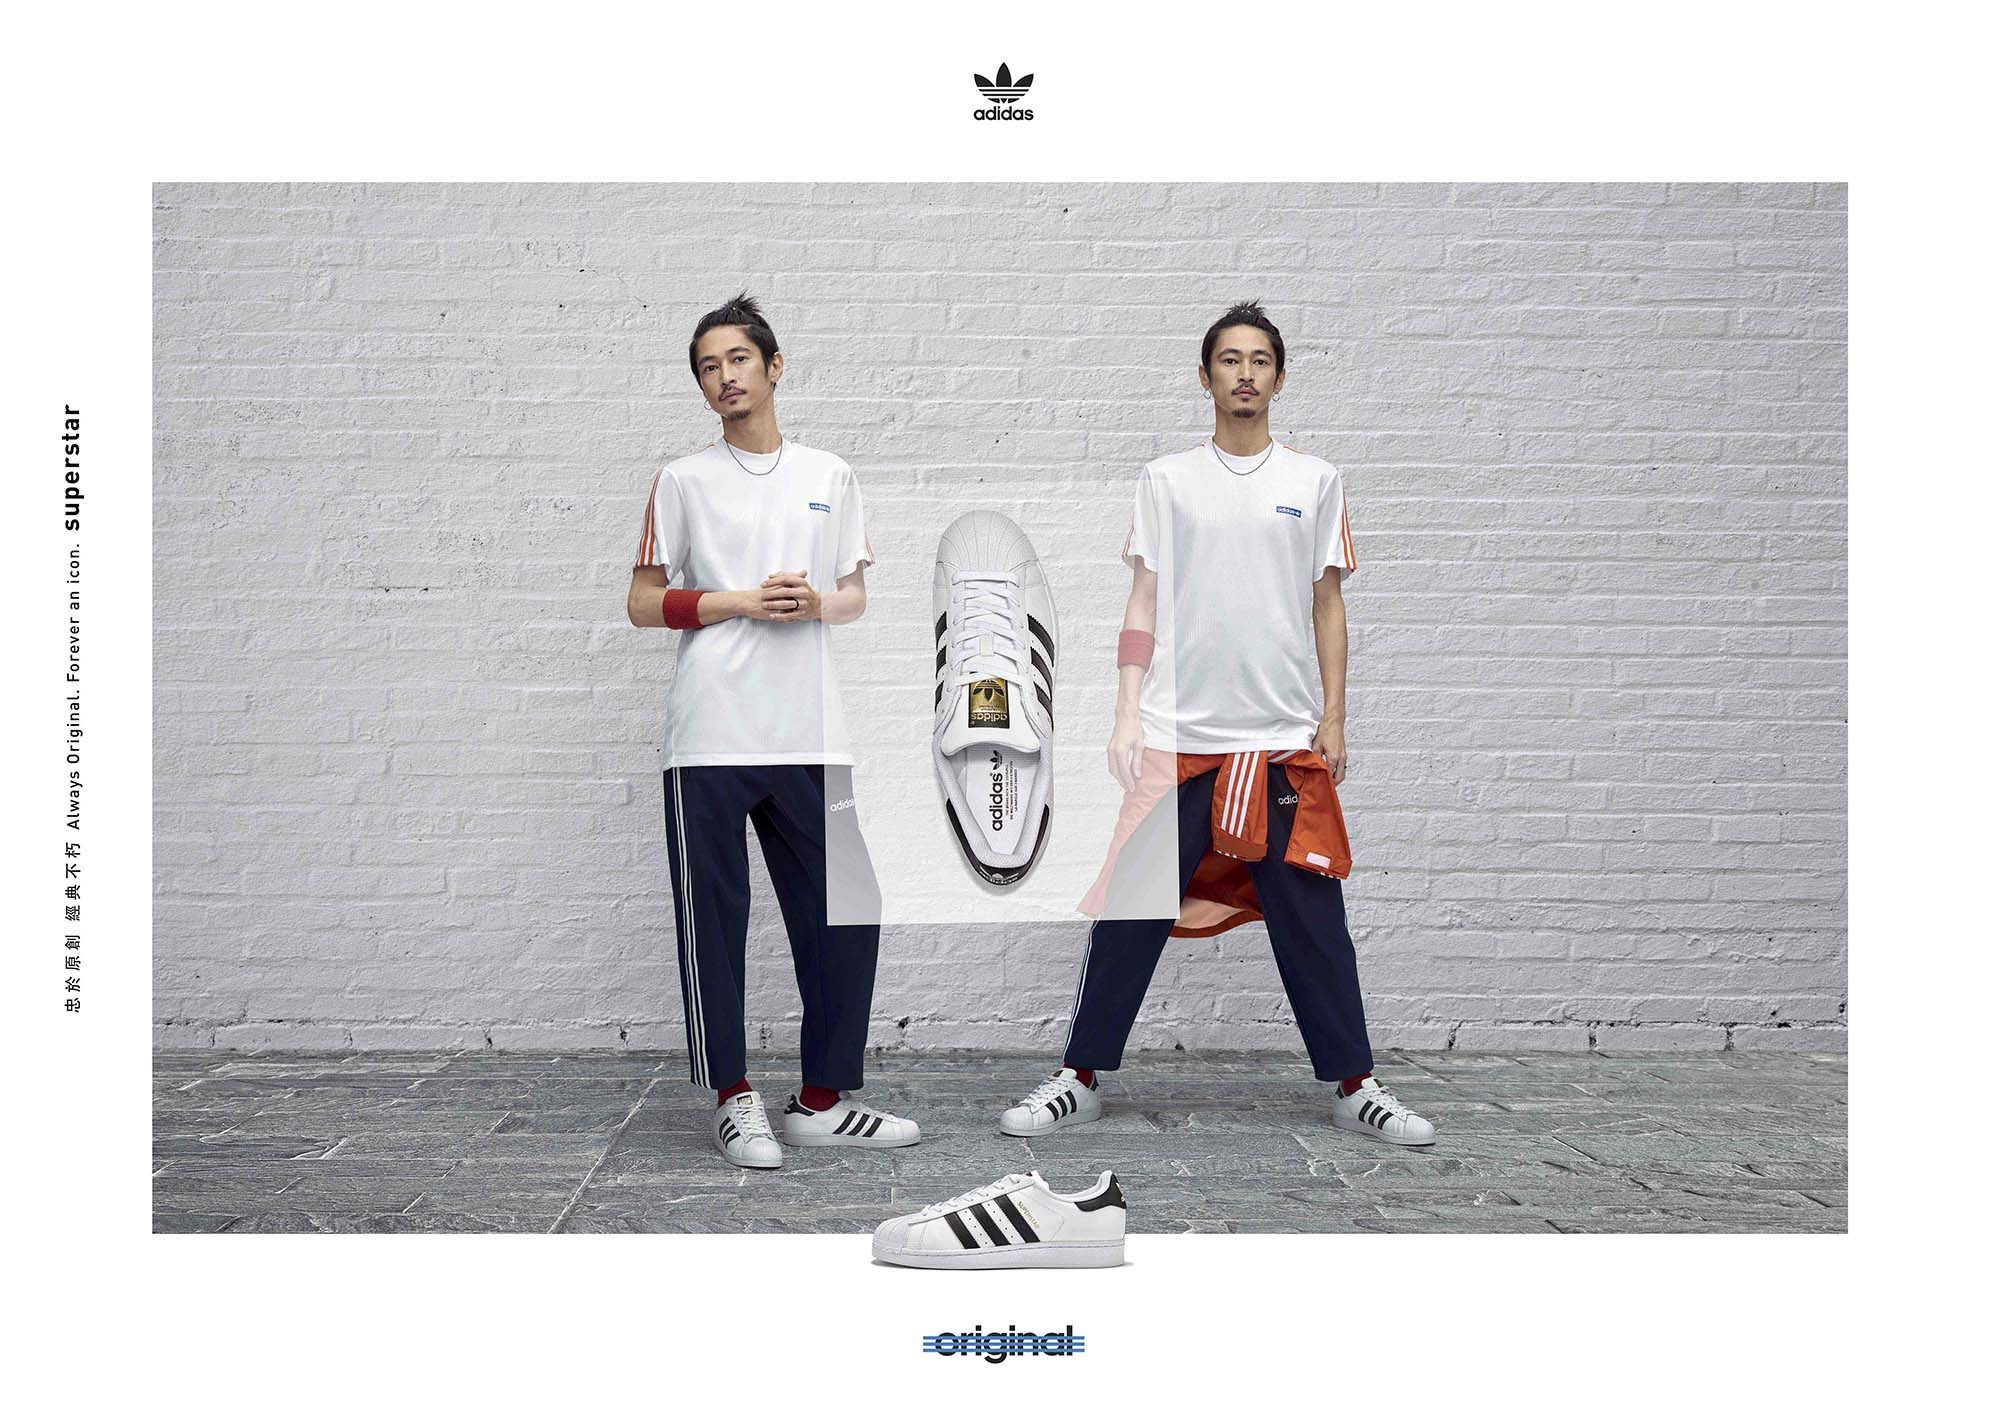 adidas-originals-osaka-wear-series-03